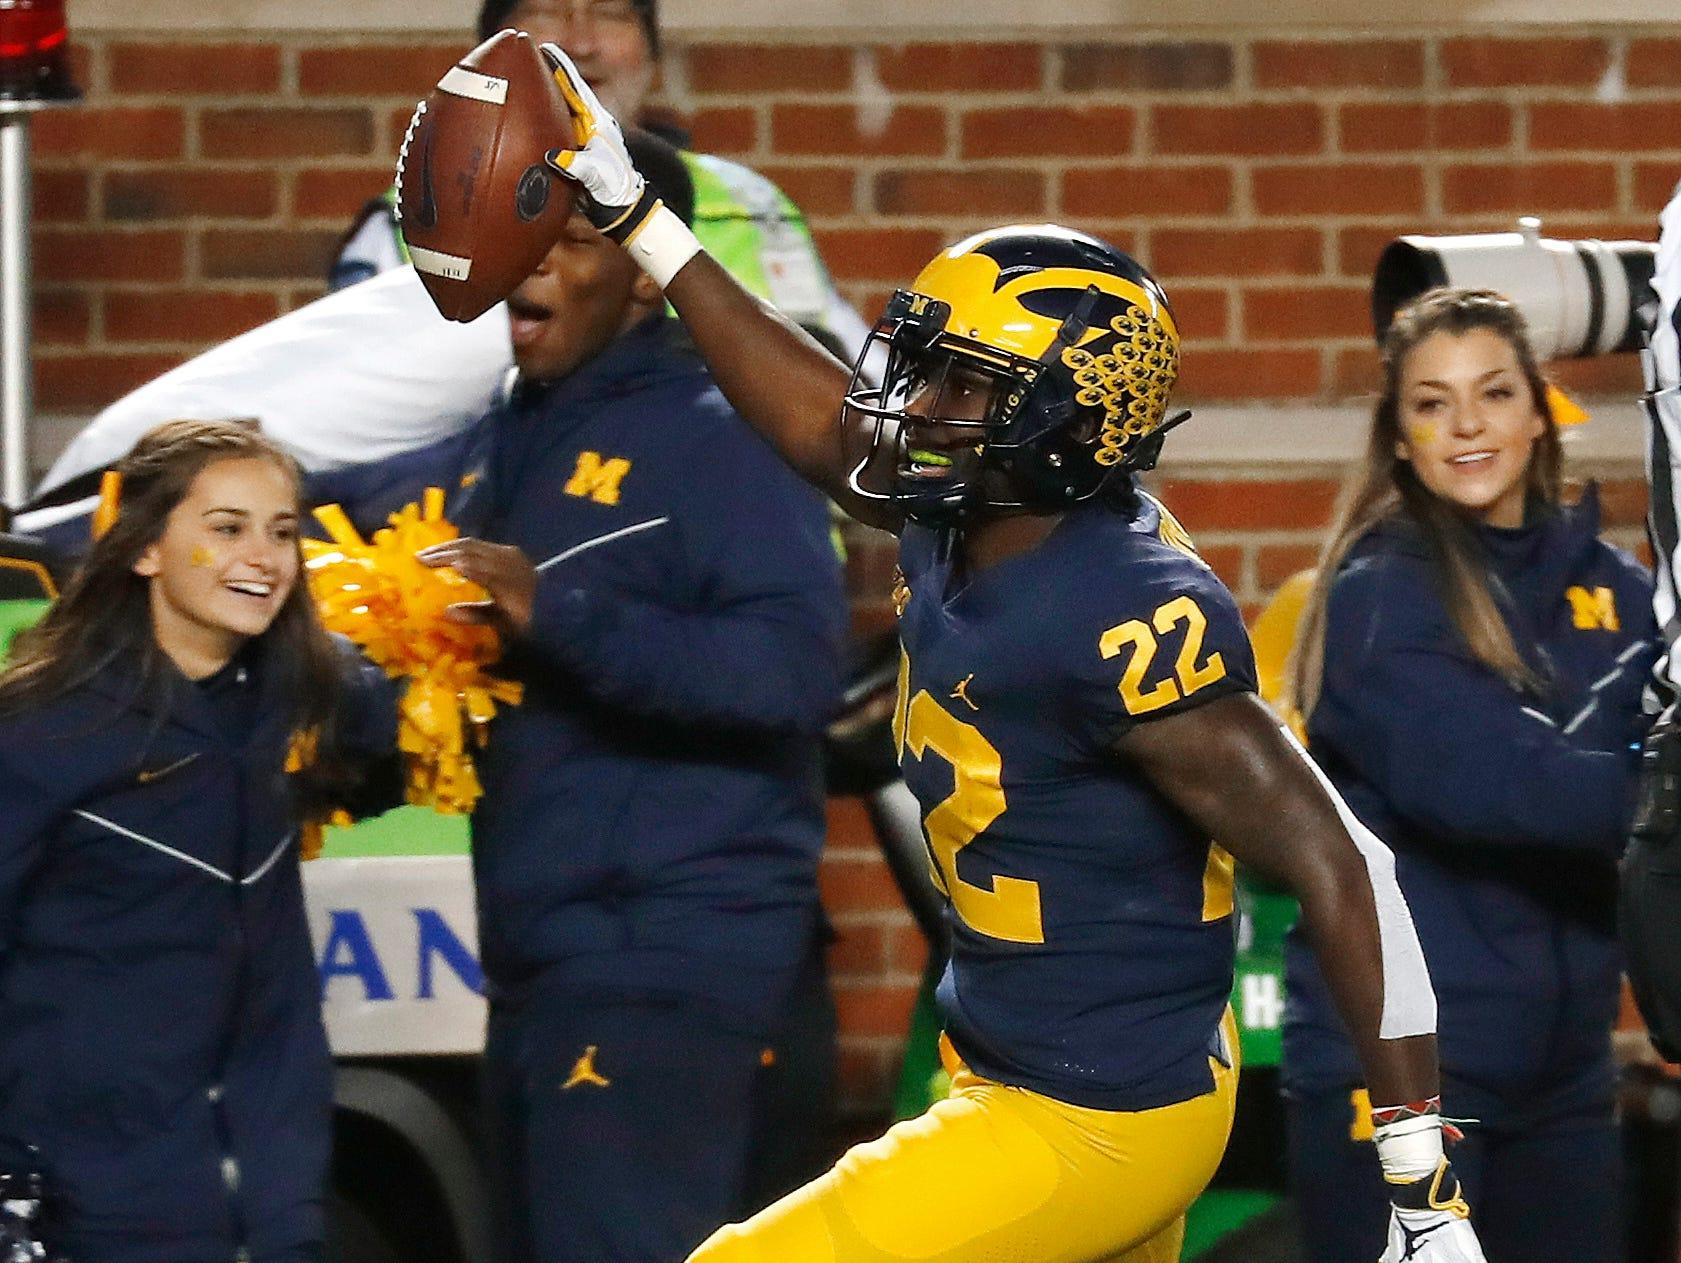 Michigan defensive back David Long (22) celebrates his interception against Penn State in the second half of an NCAA college football game in Ann Arbor, Mich., Saturday, Nov. 3, 2018. (AP Photo/Paul Sancya)